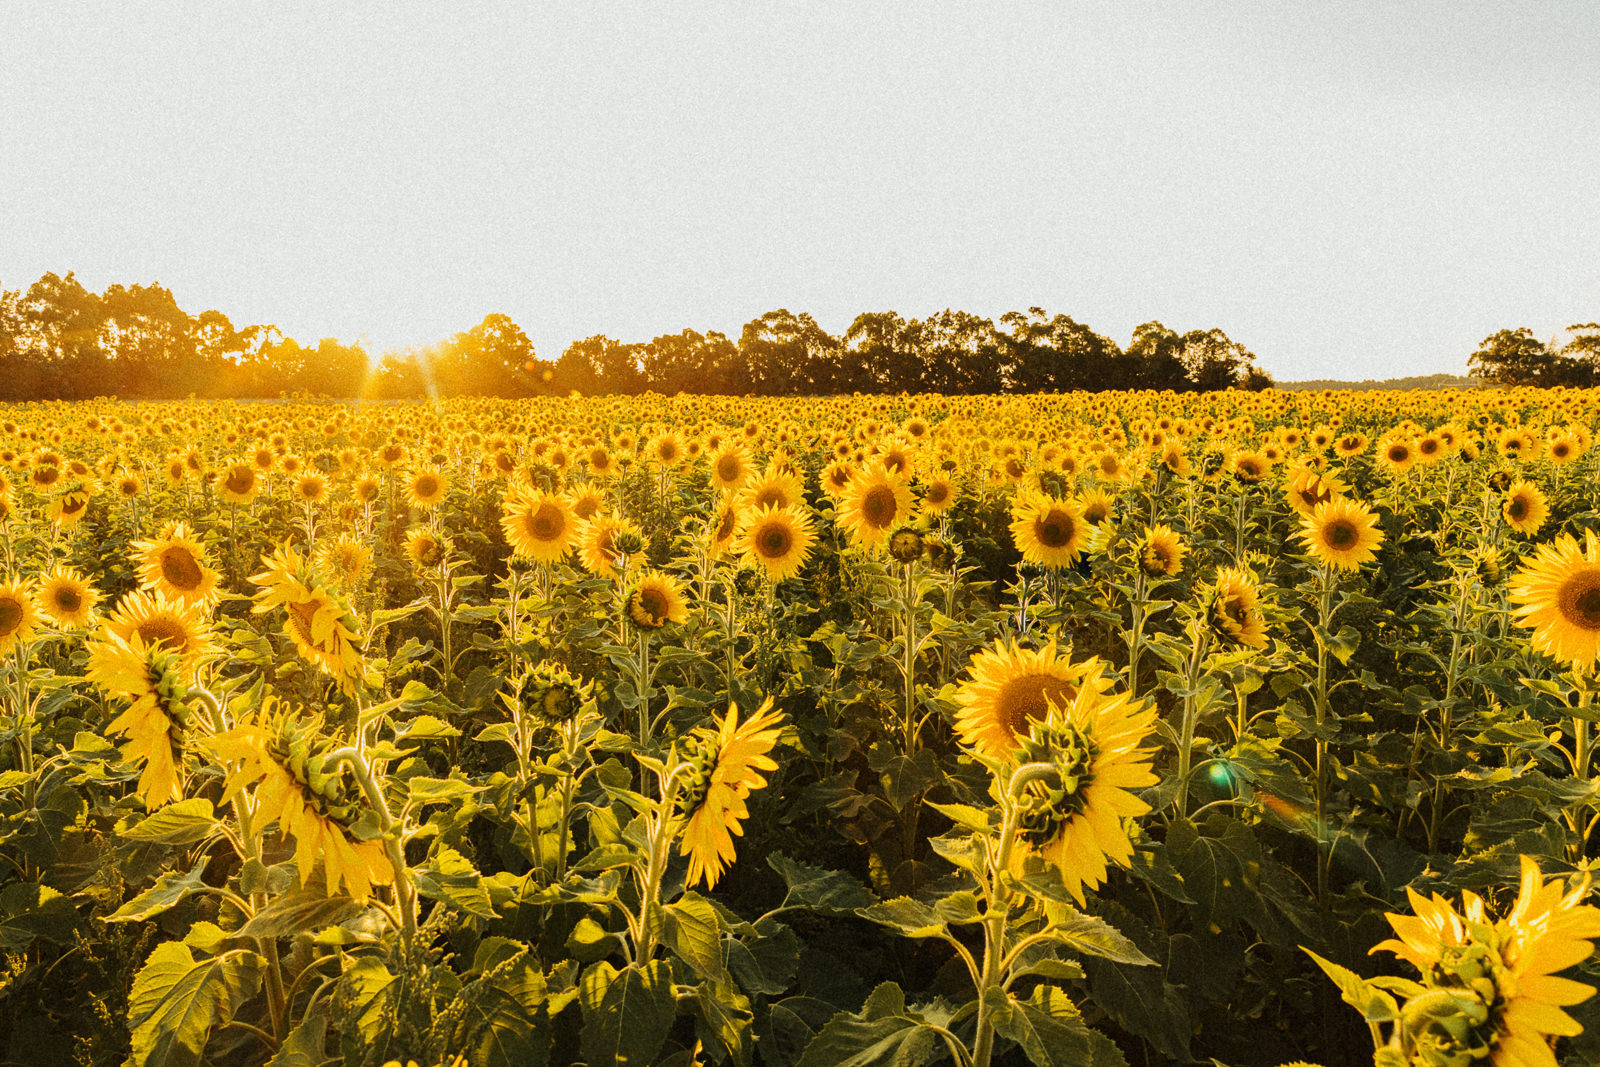 sunflower field near melbourne, australia - best photos of sunflowers